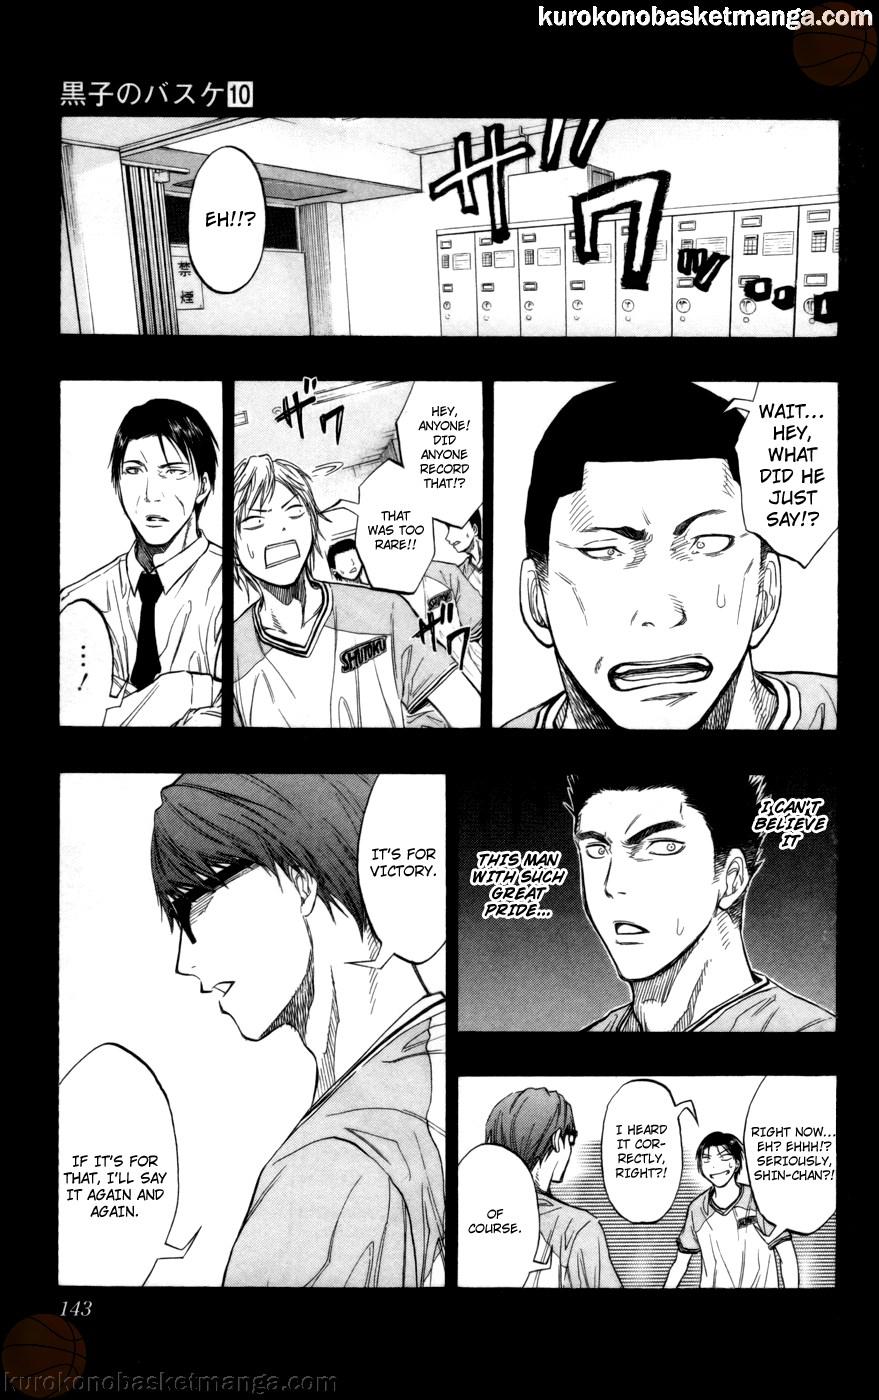 Kuroko no Basket Manga Chapter 87 - Image 17